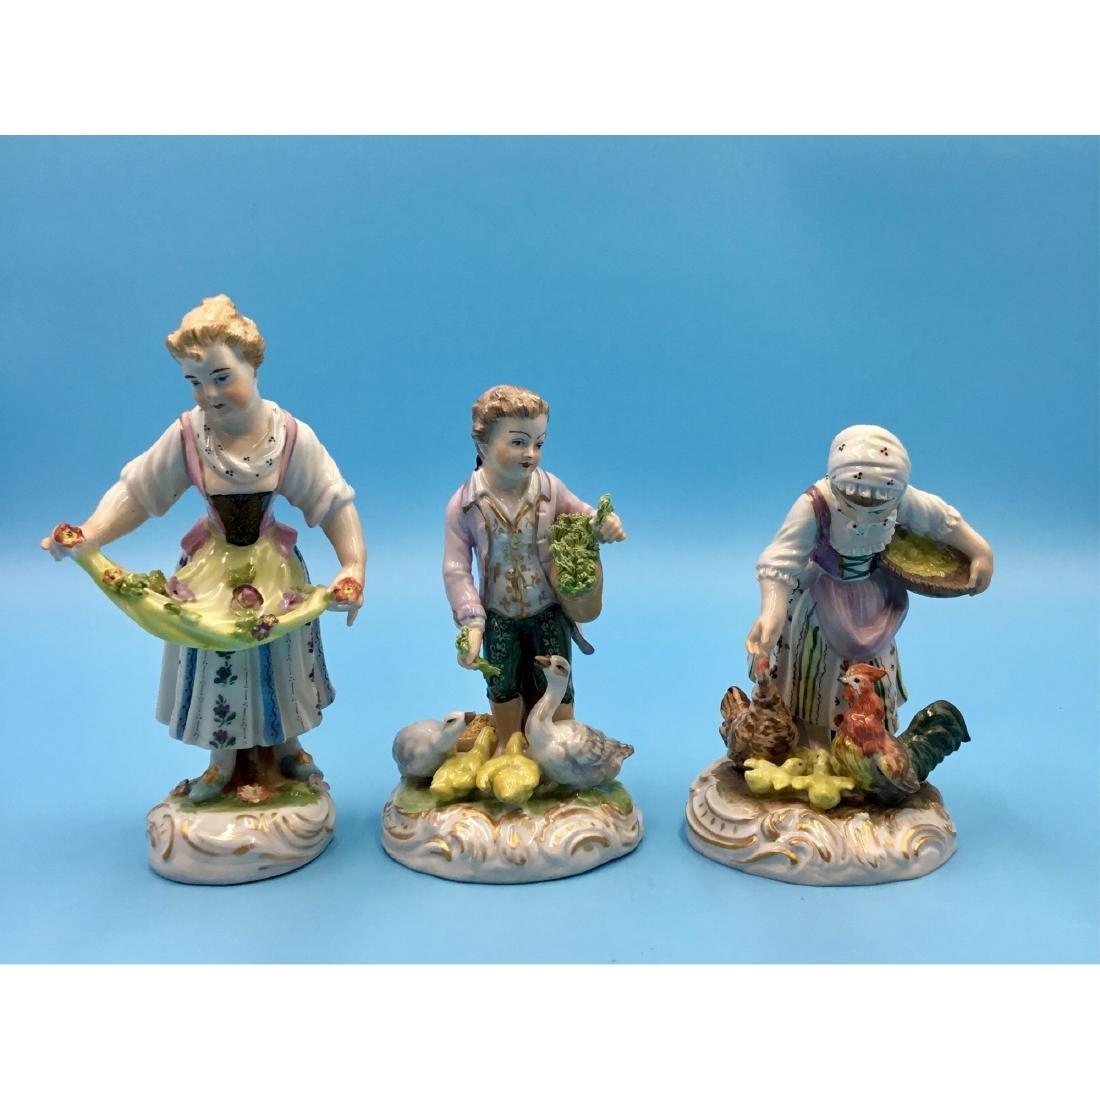 GROUP OF 3 DRESDEN GERMAN PORCELAIN FIGURINES